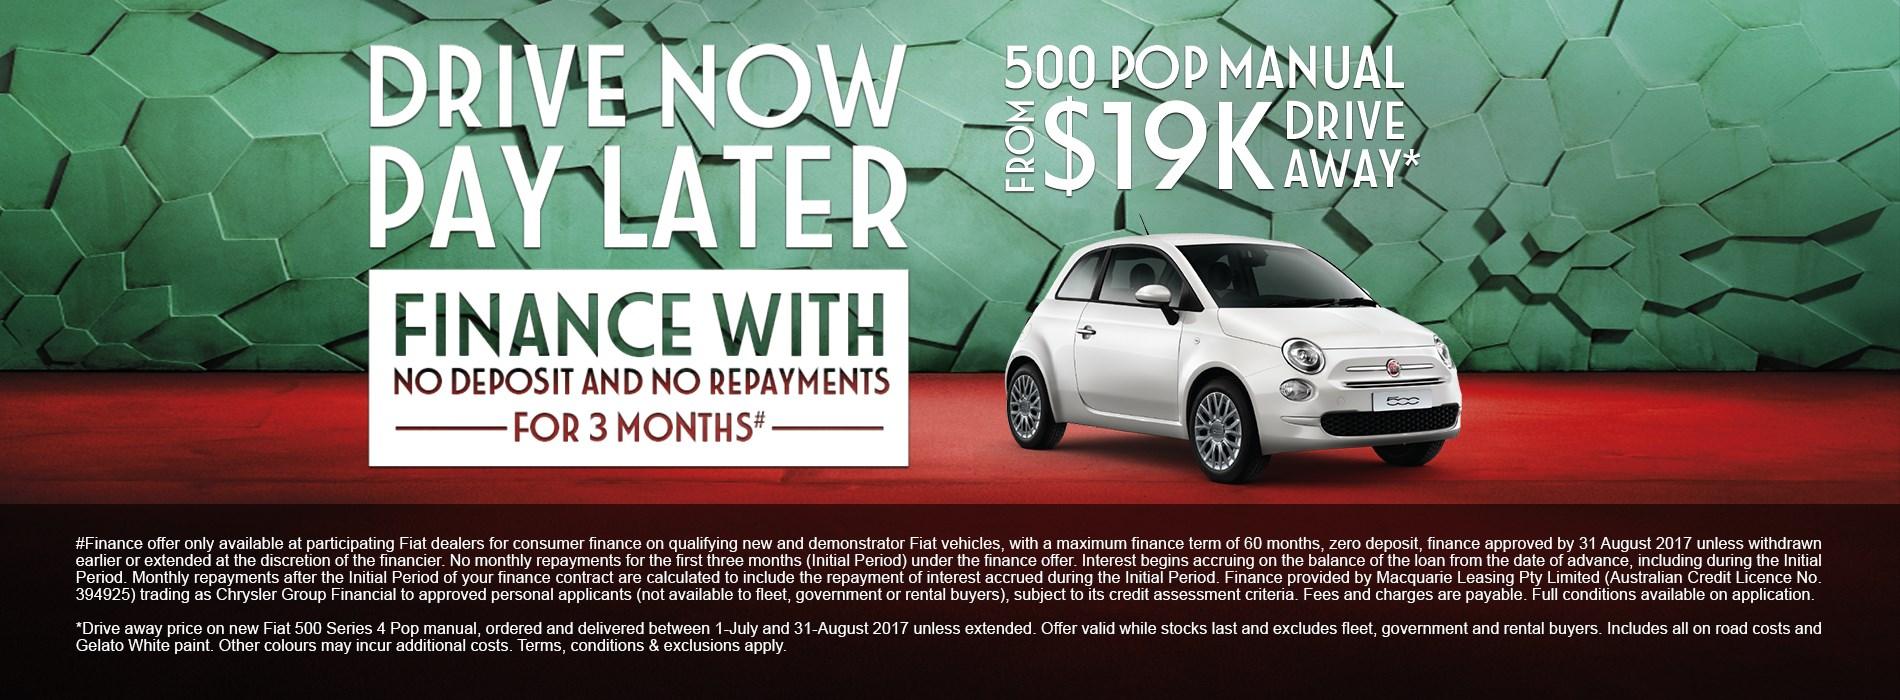 Fiat 500 Pop Manual $19K Drive Away Offer